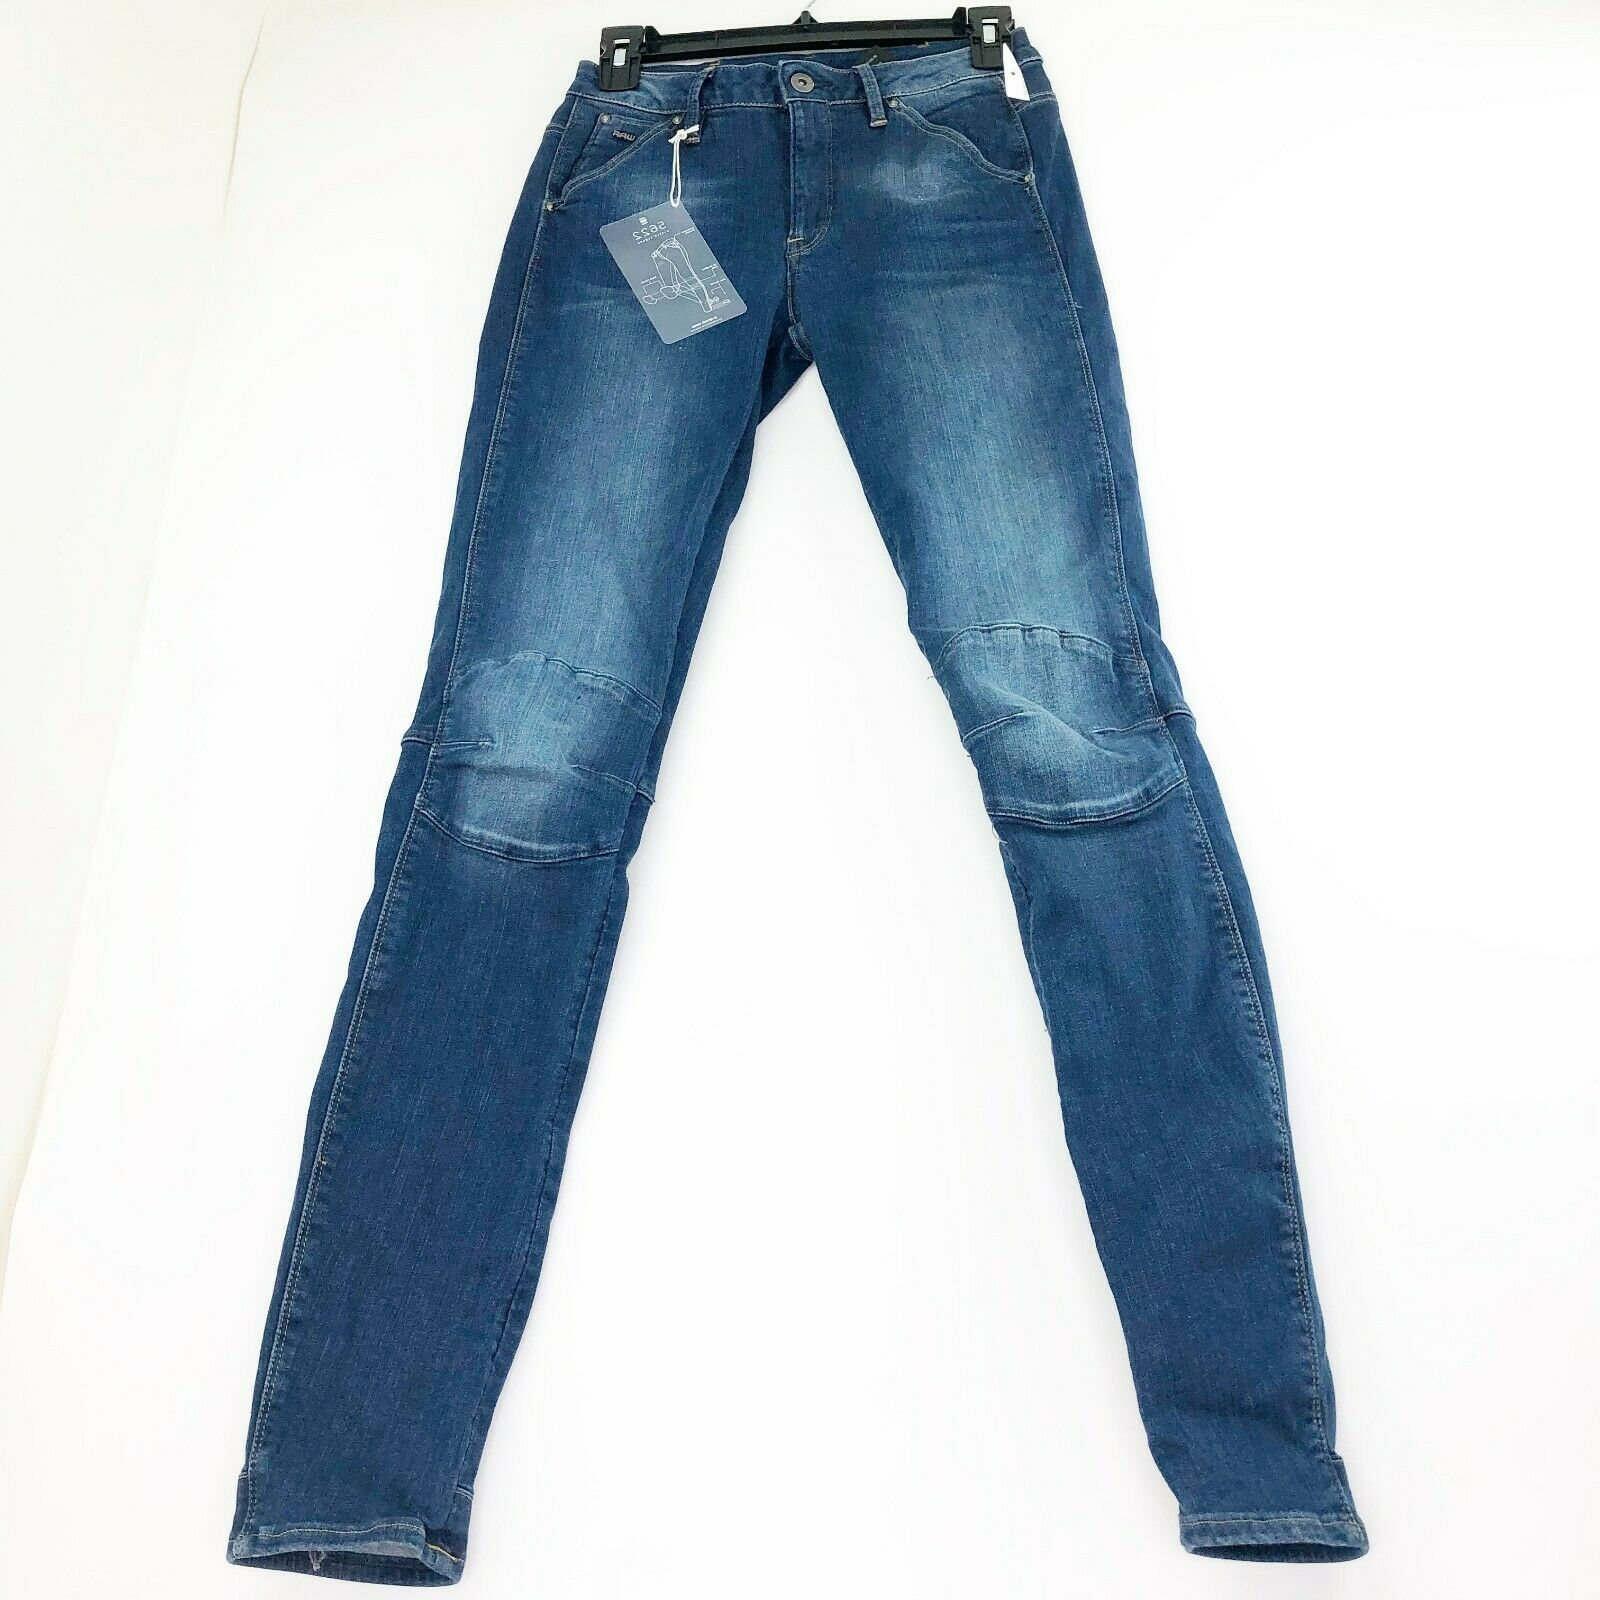 G stjärna Raw 5622 Mid -Waist Skinny Jeans Sz 25